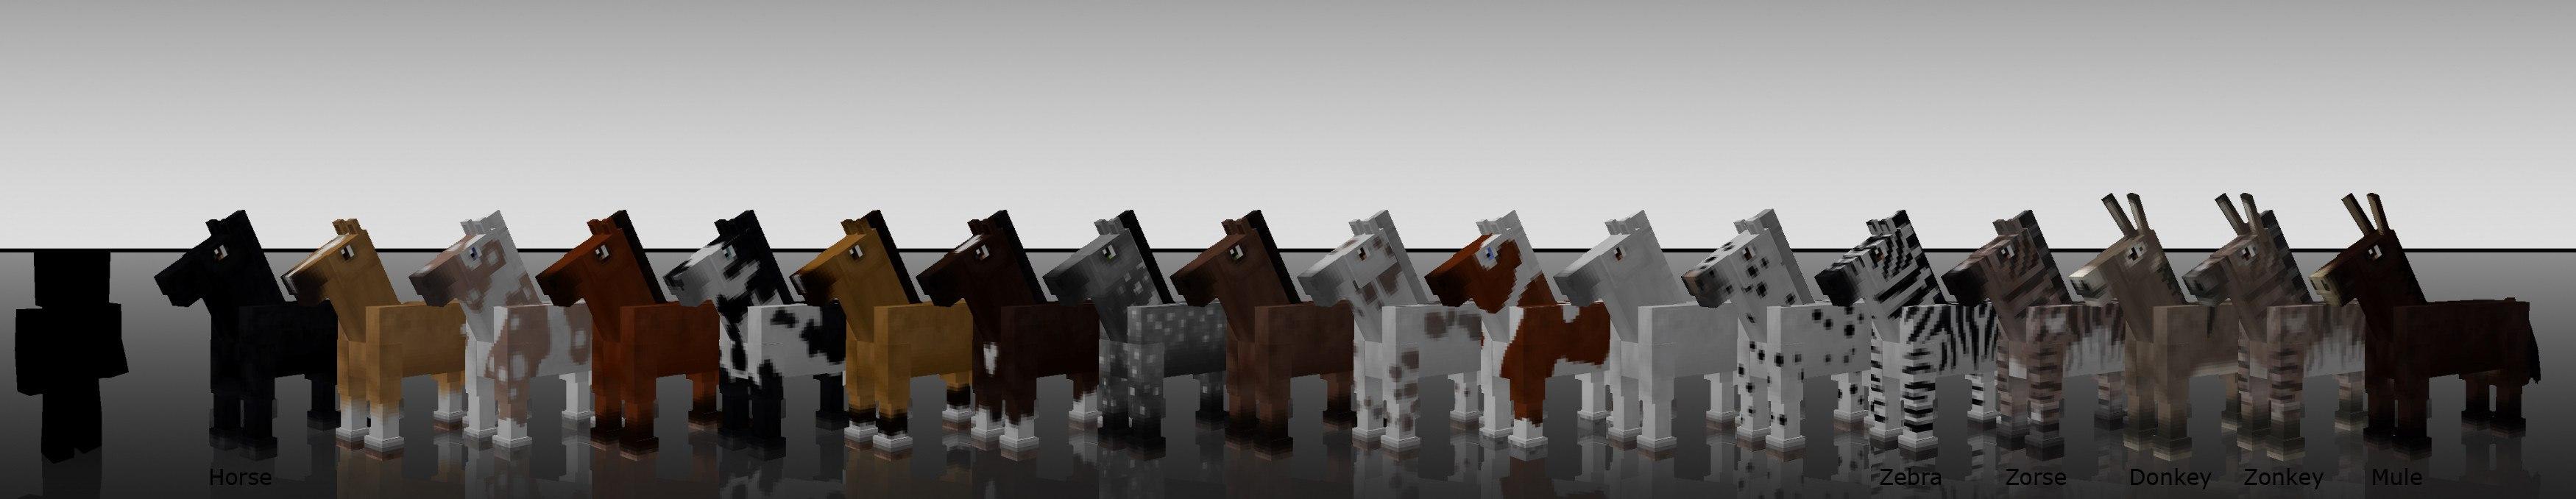 Mo-Creatures-konie